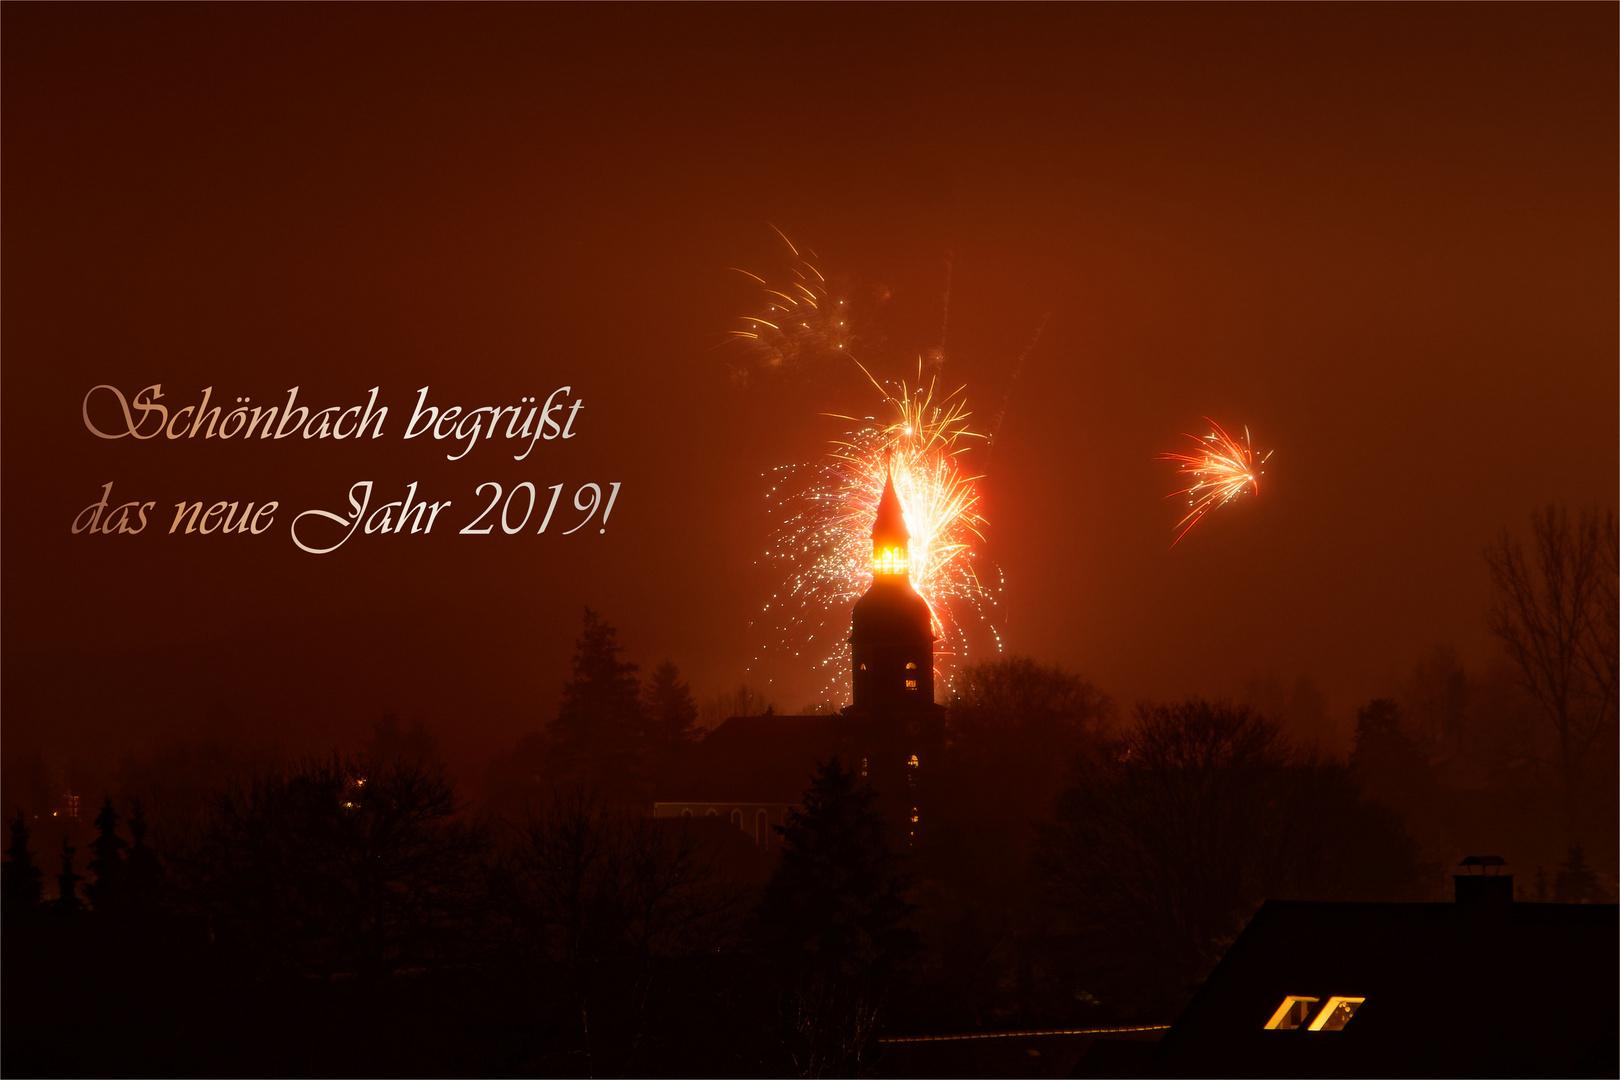 Schönbach begrüßt 2019